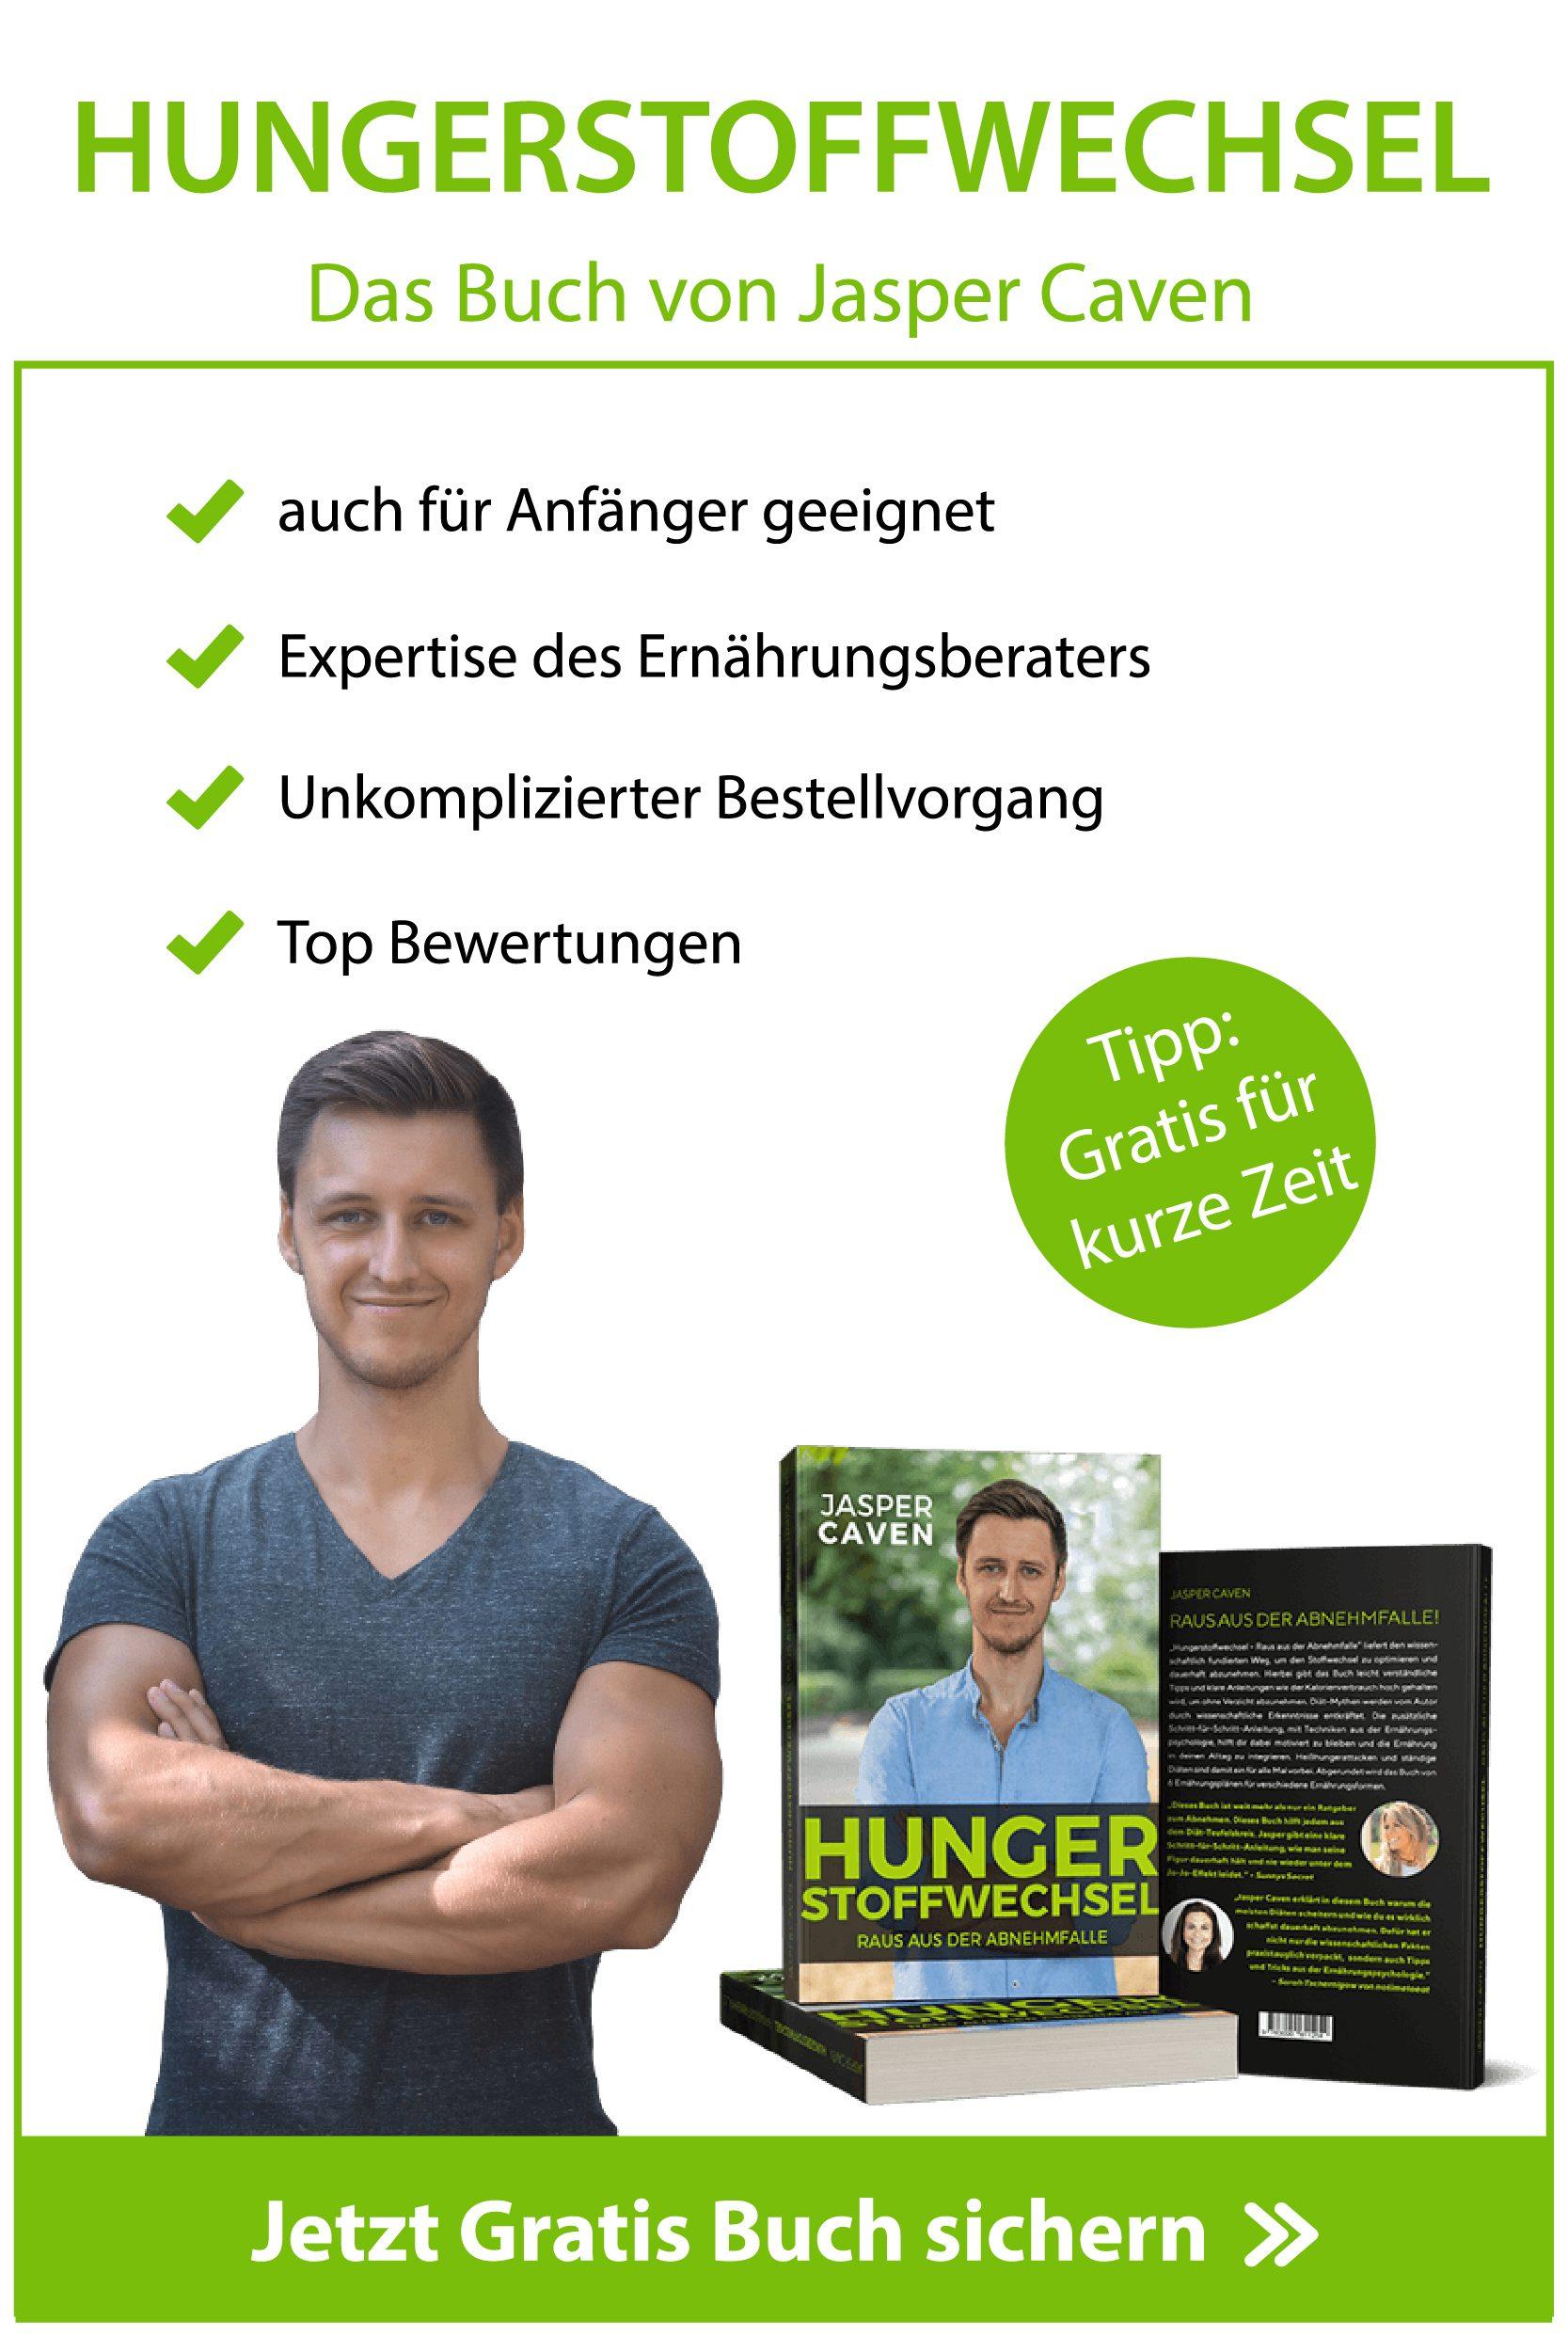 Hungerstoffwechsel_mobil